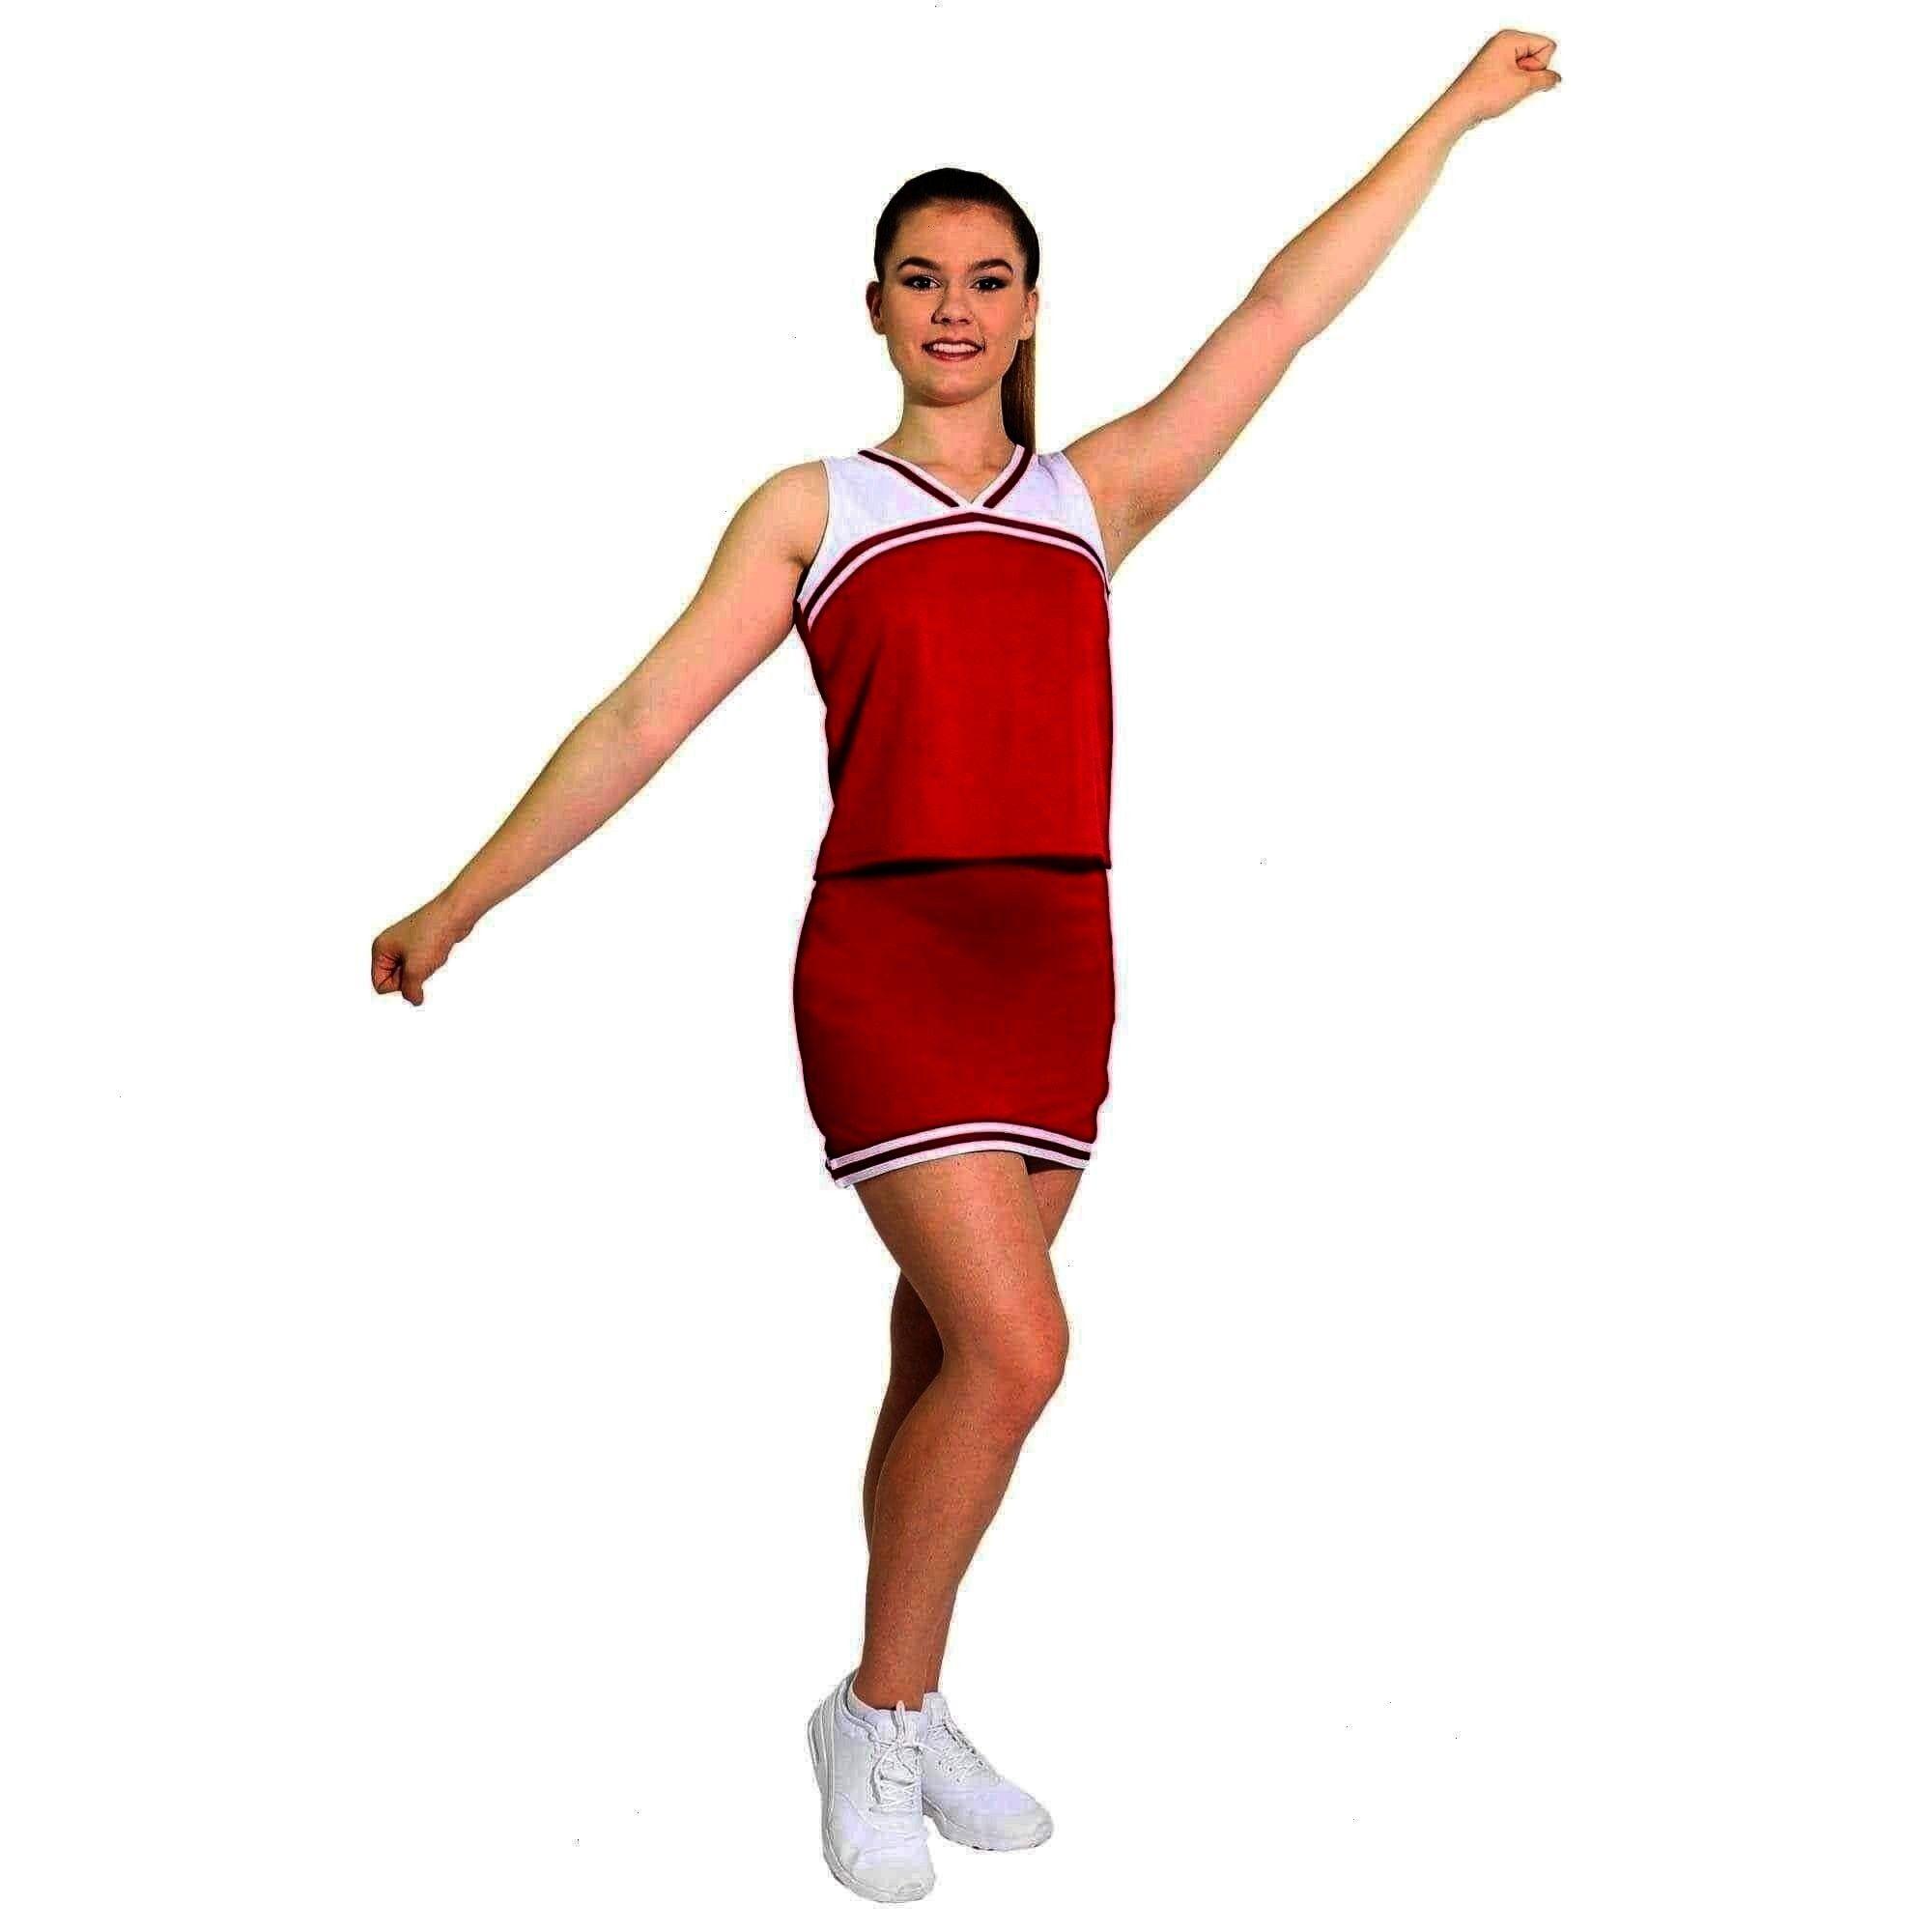 Danzcue Girls Classic Cheerleaders Uniform Shell Top